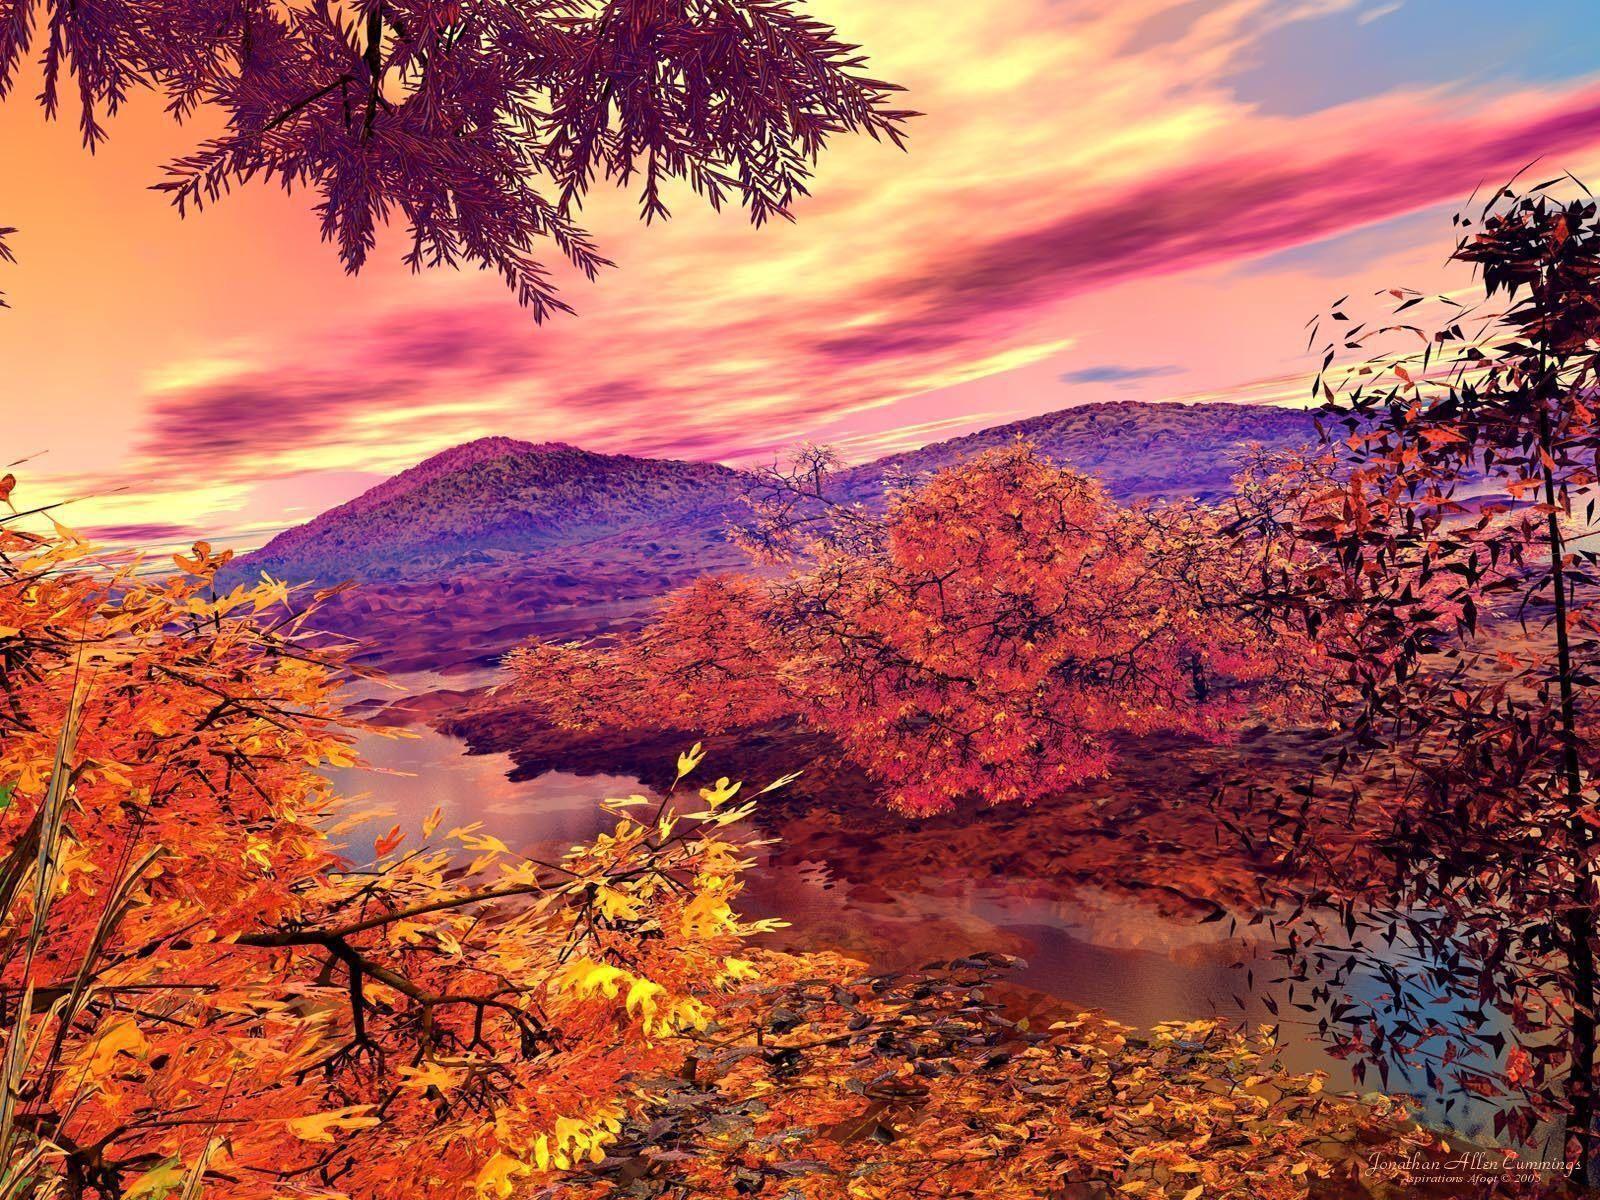 Cool Autumn wallpaper hd, Autumn scenery, Fall wallpaper